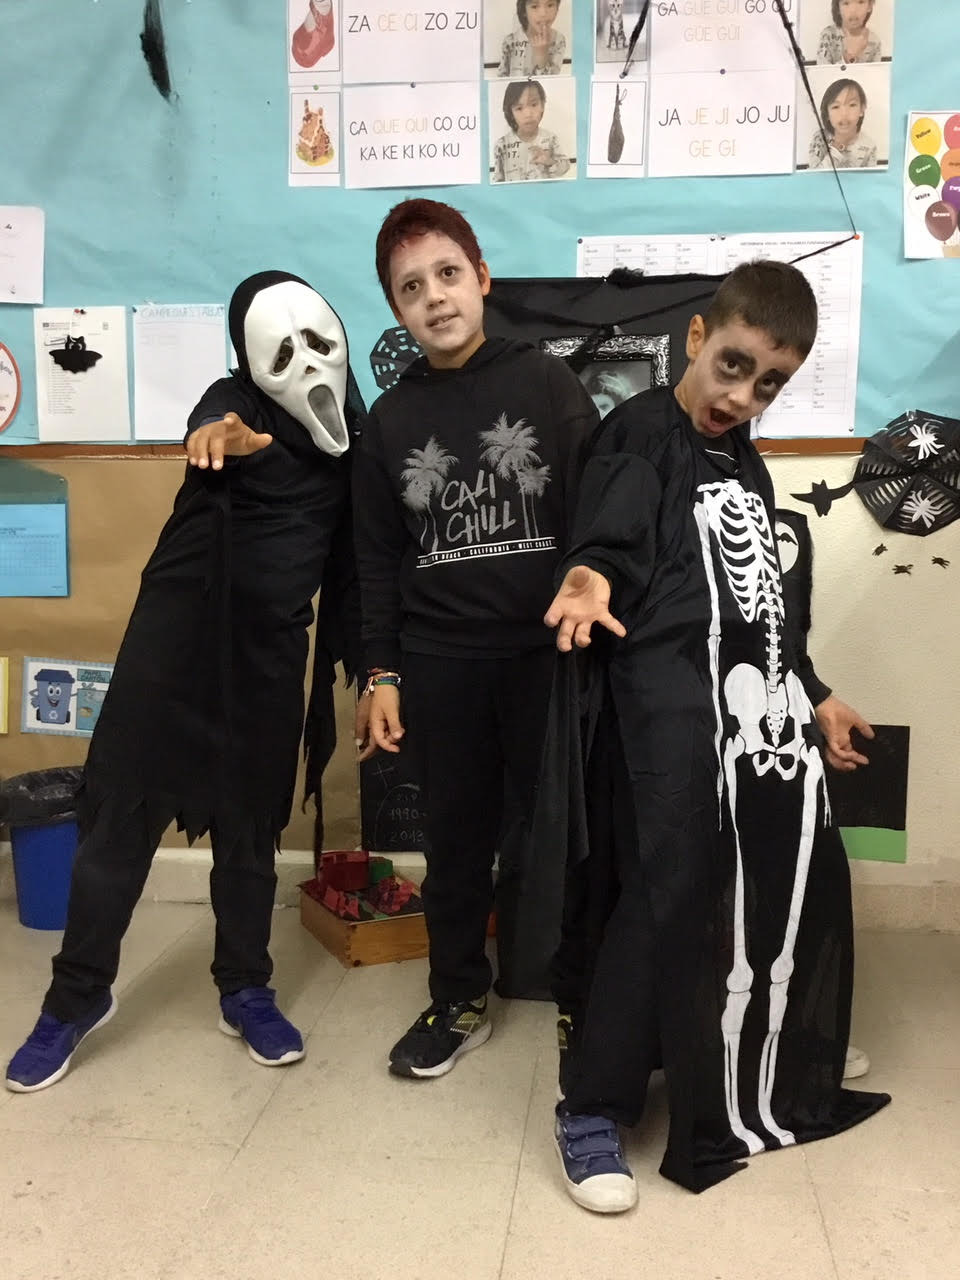 2018_10_31_Cuarto B disfruta en Halloween_CEIP FDLR_Las Rozas 3